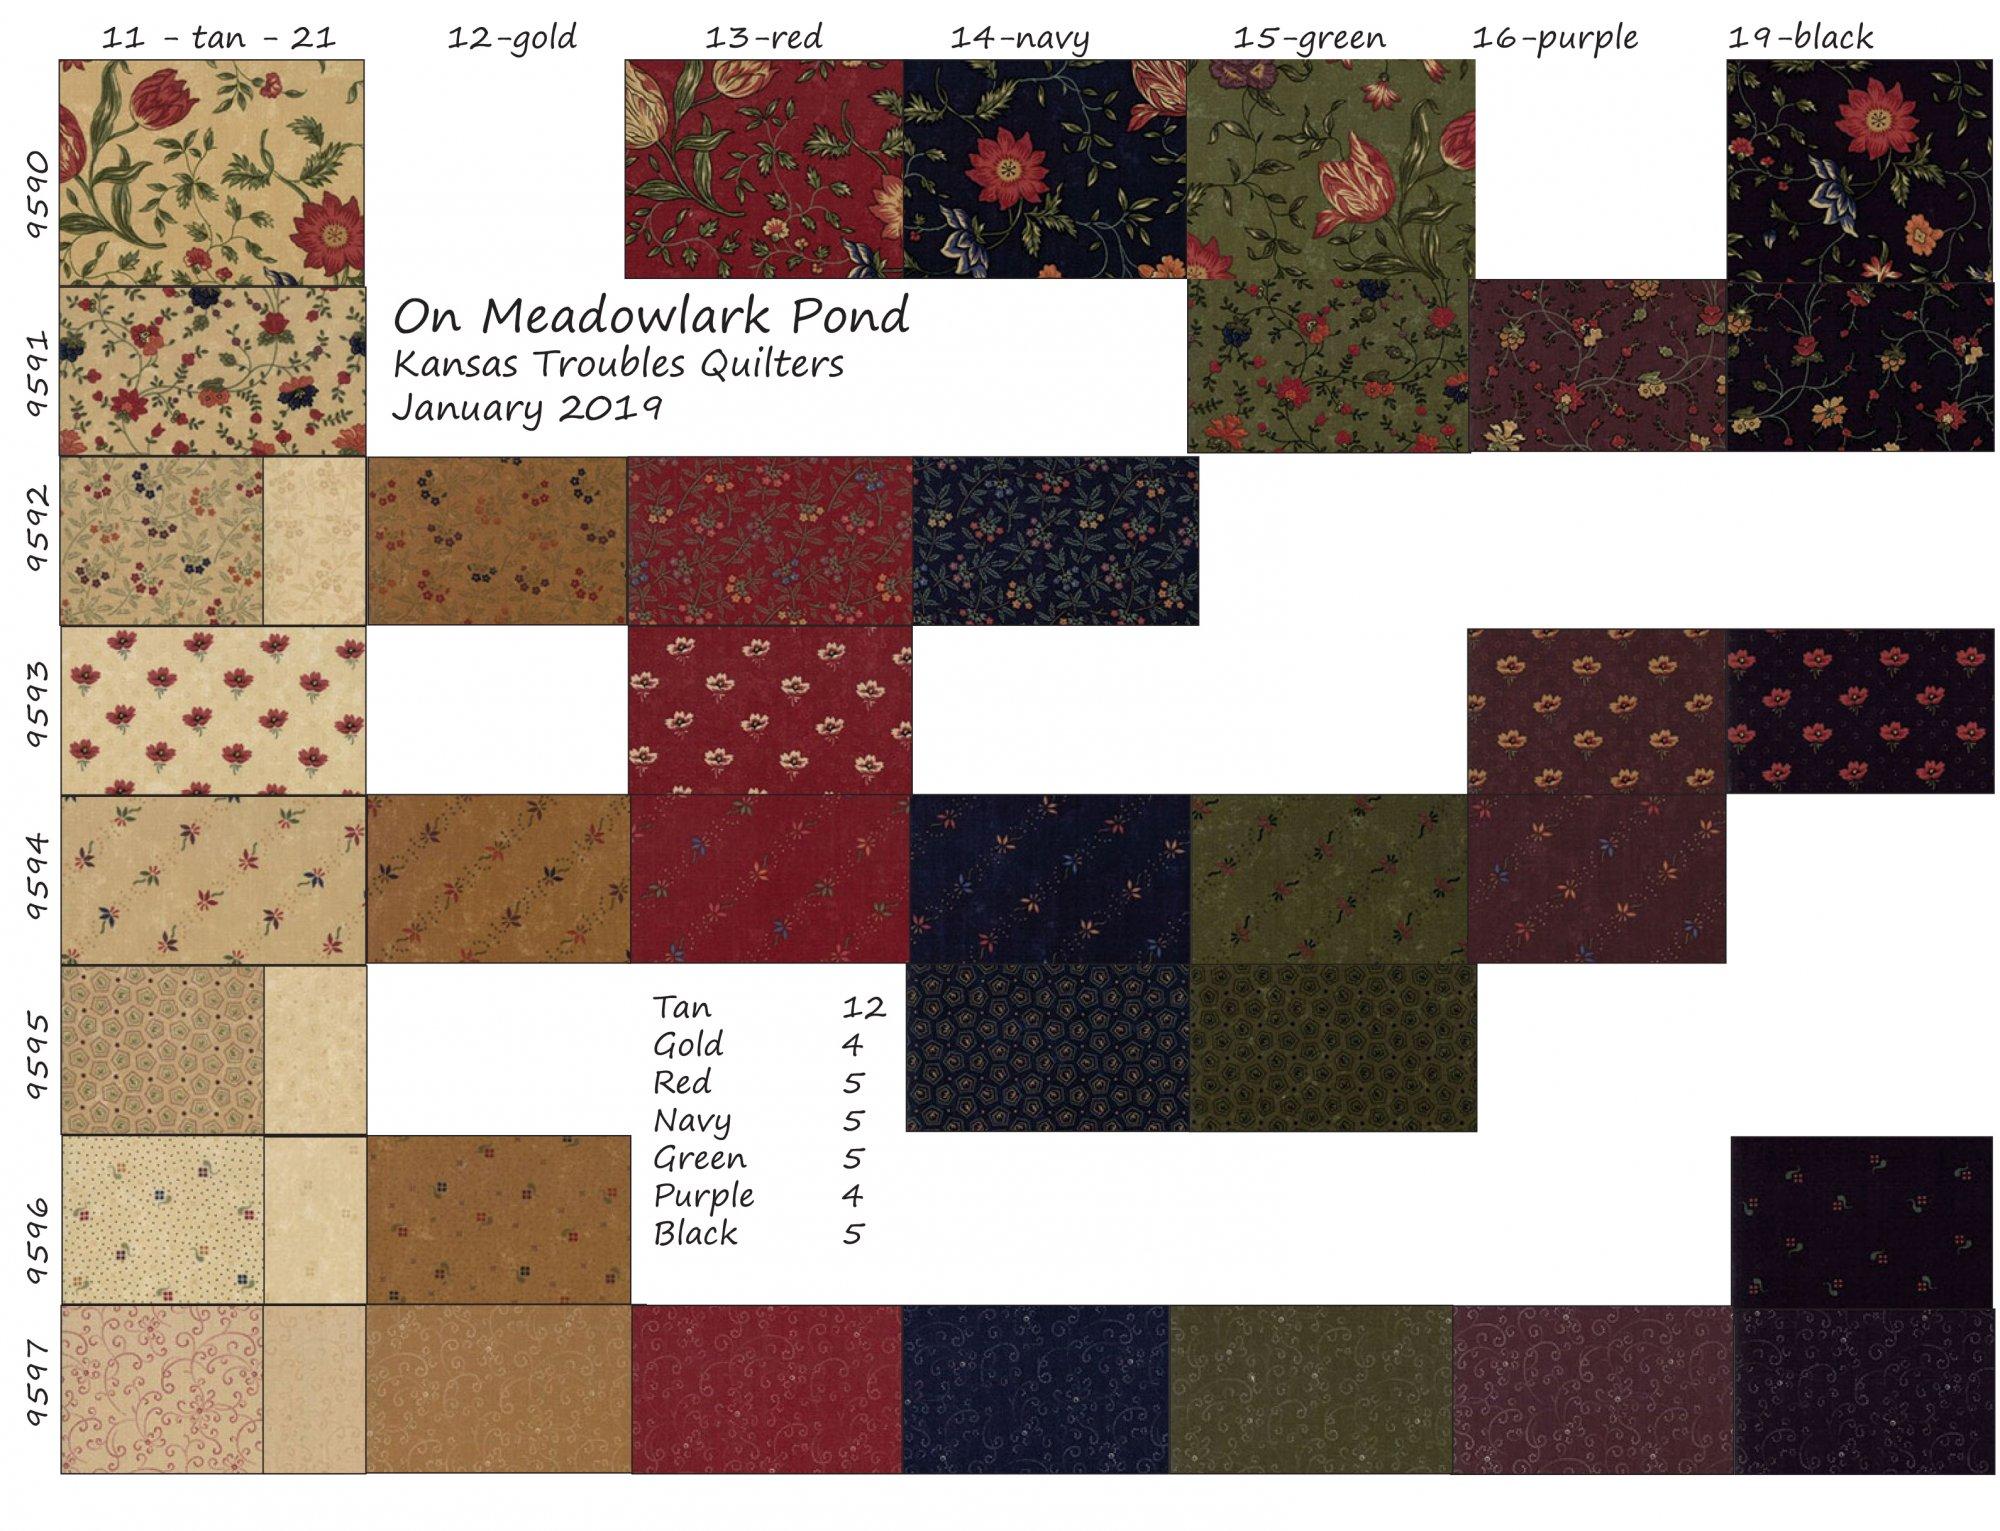 On Meadowlark Pond SKU Chart